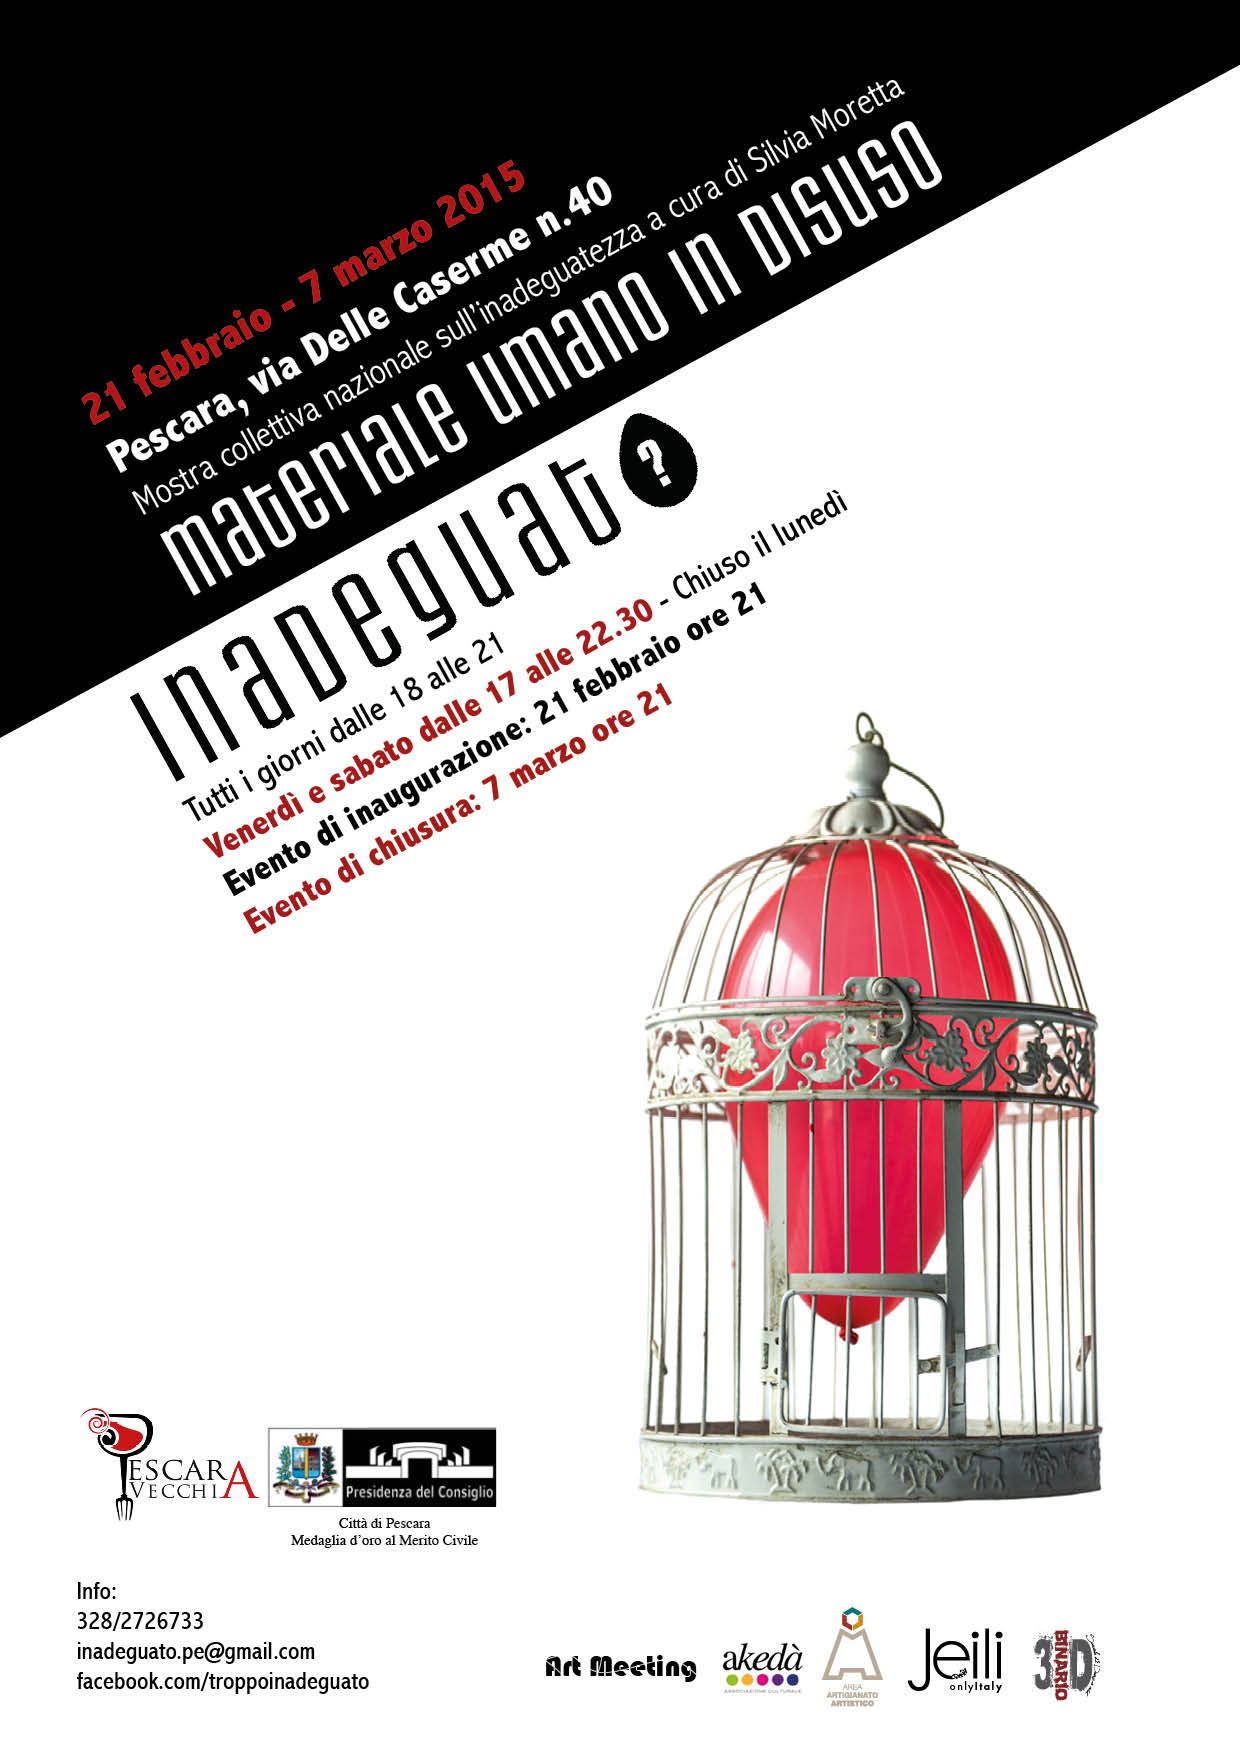 Inadeguato – Pescara (2 images)